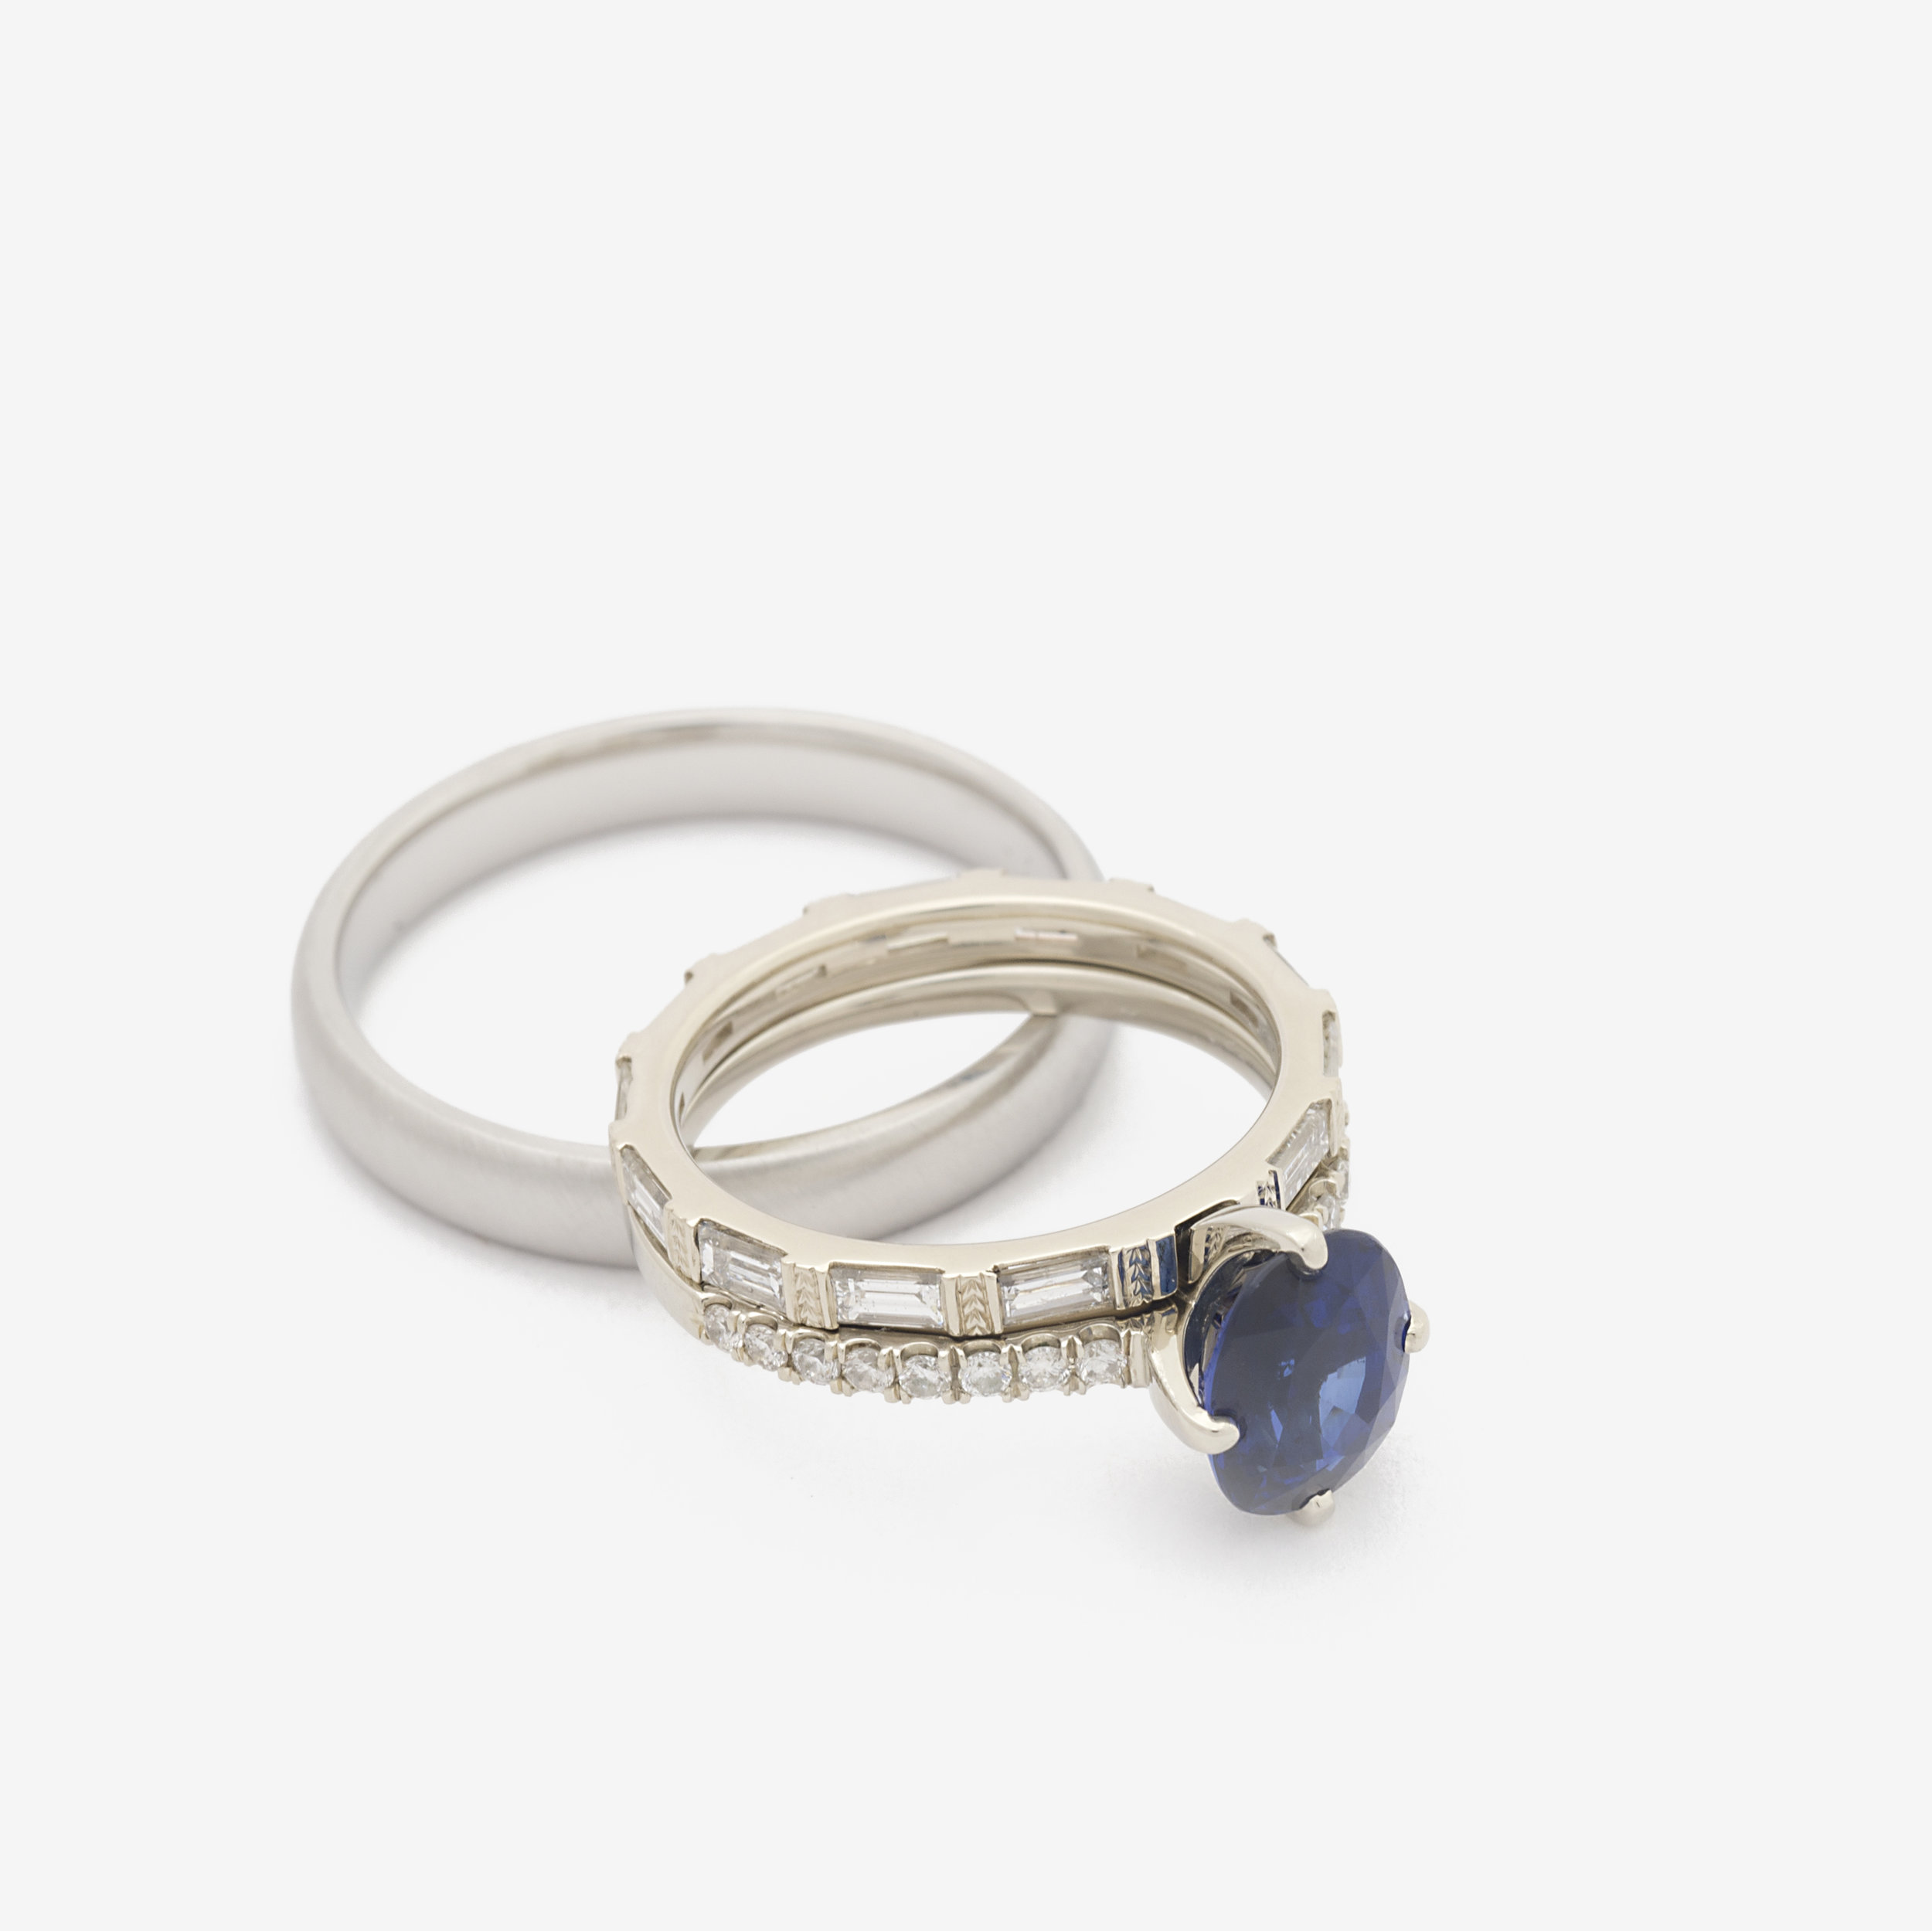 Michaela - Interlocking Engagement Ring and Band + His Platinum Band.jpg